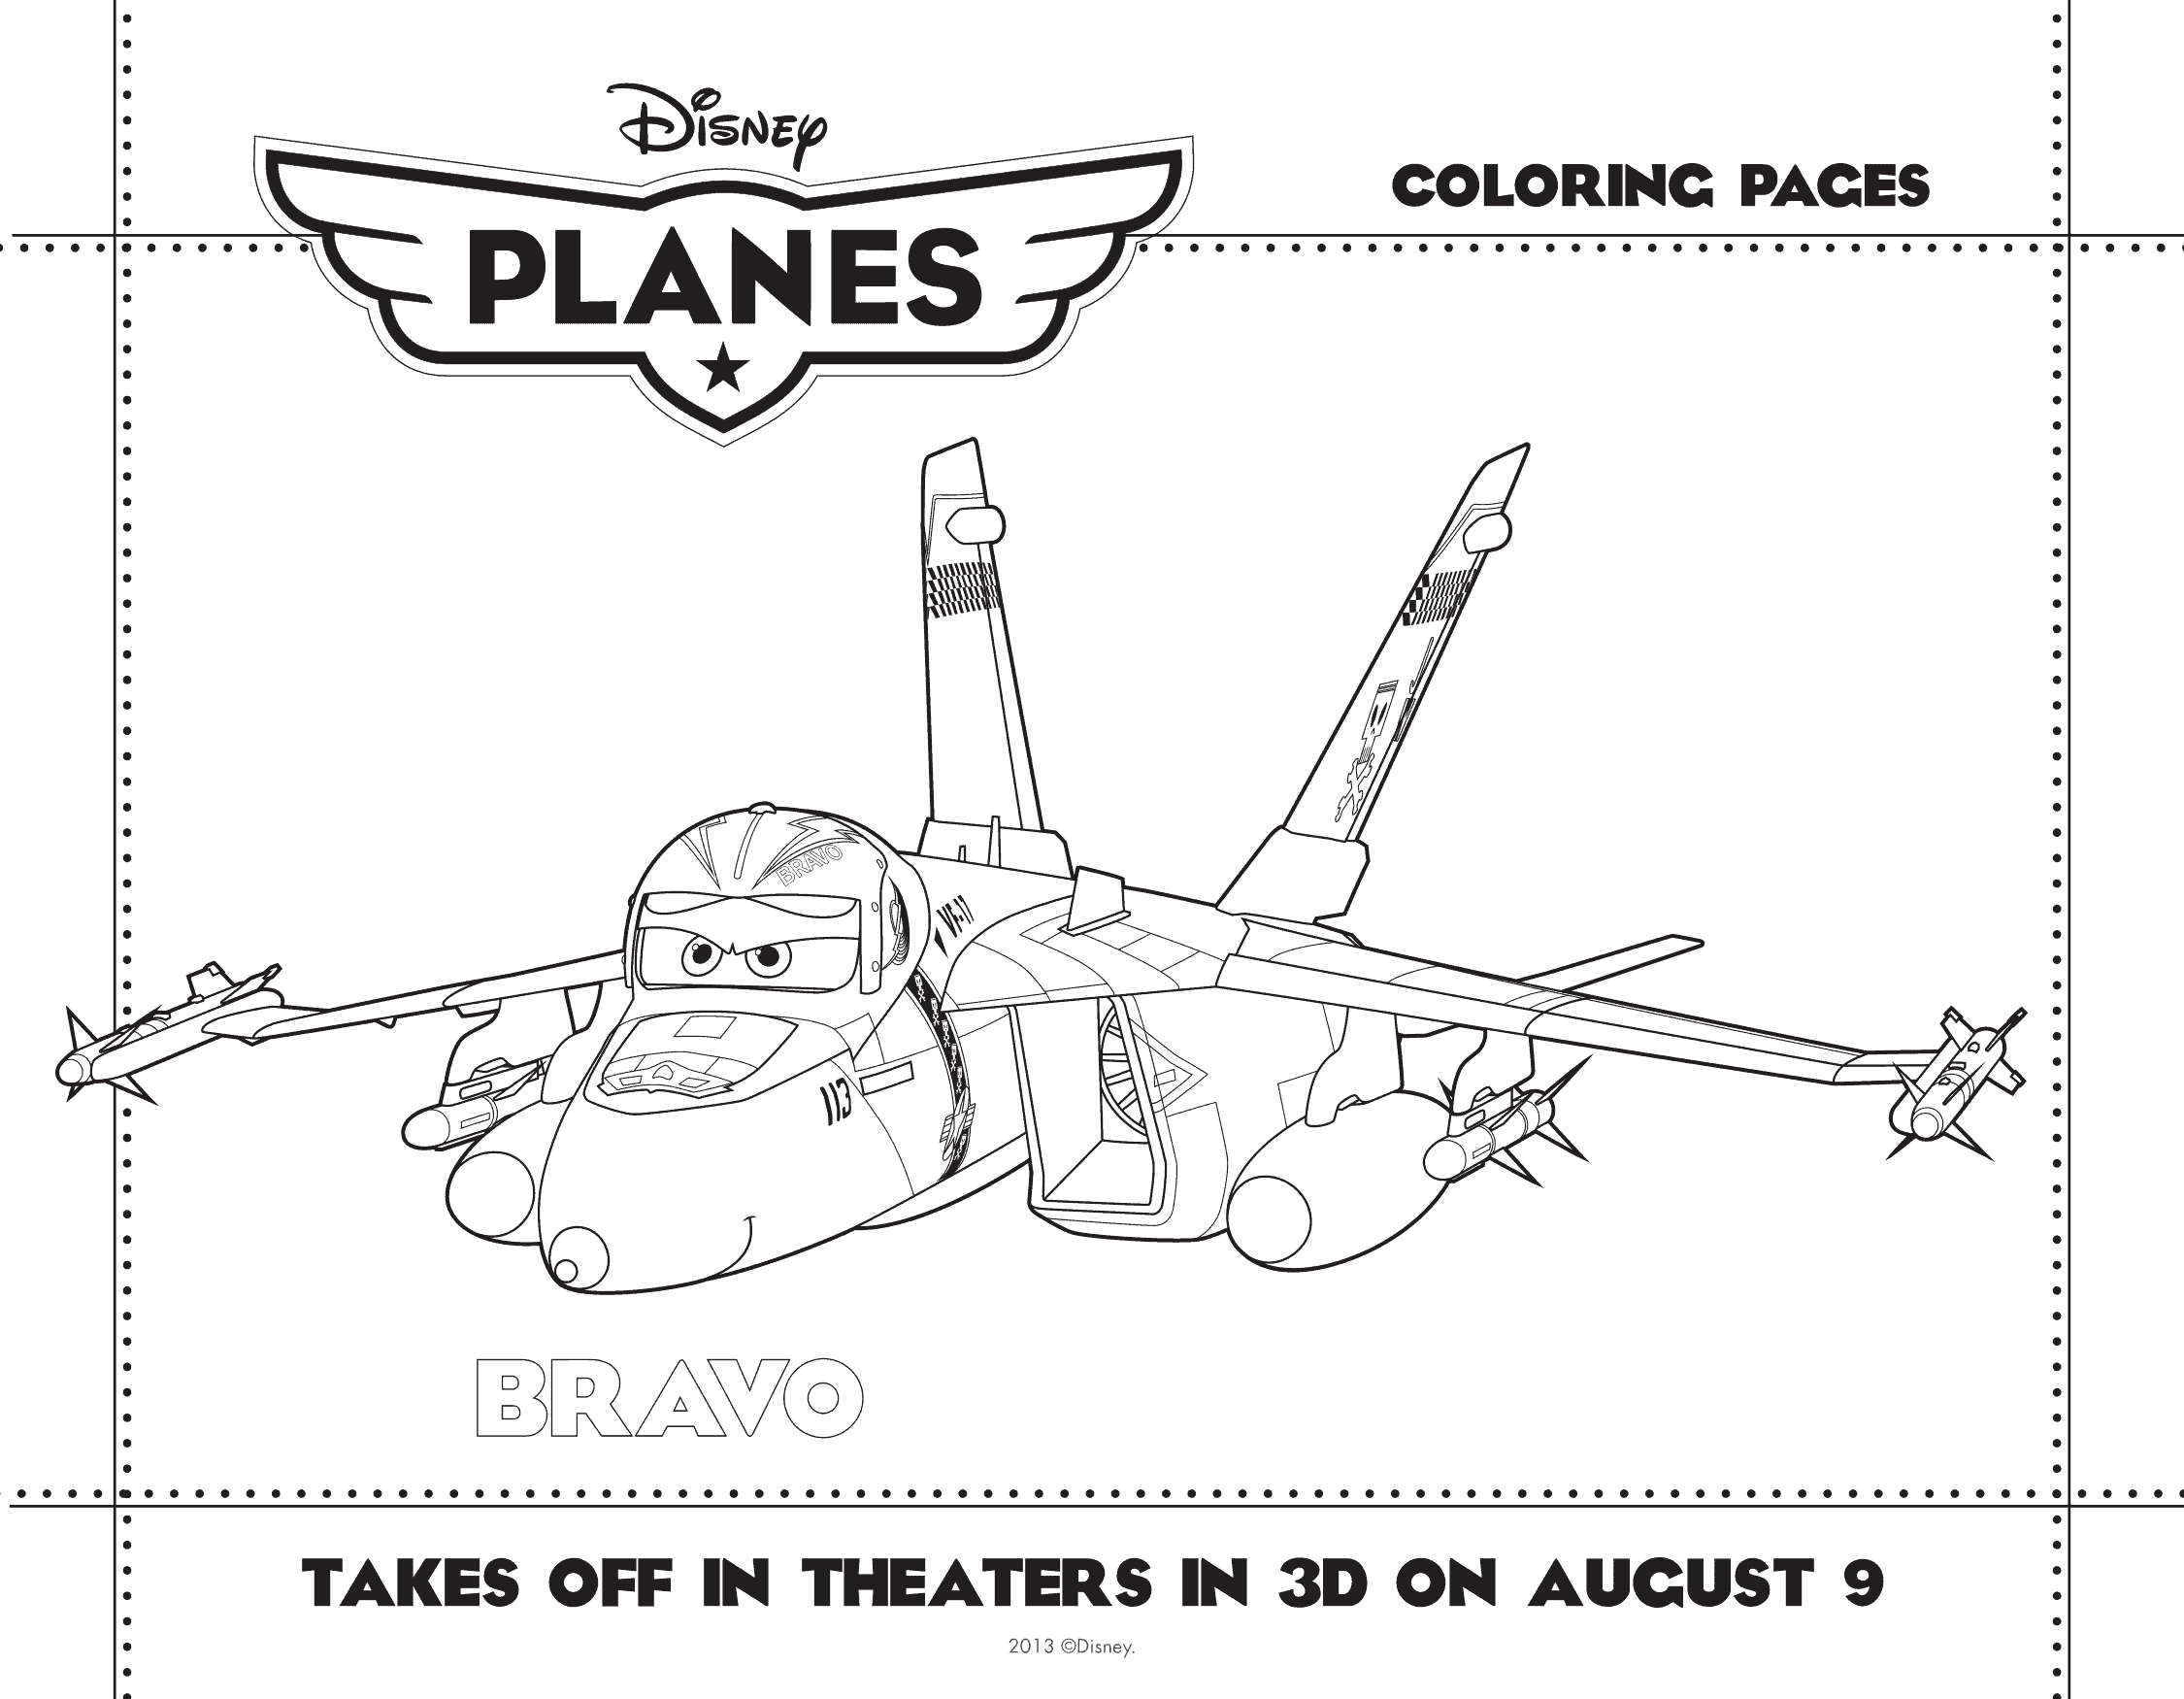 PLANES coloring sheet 3